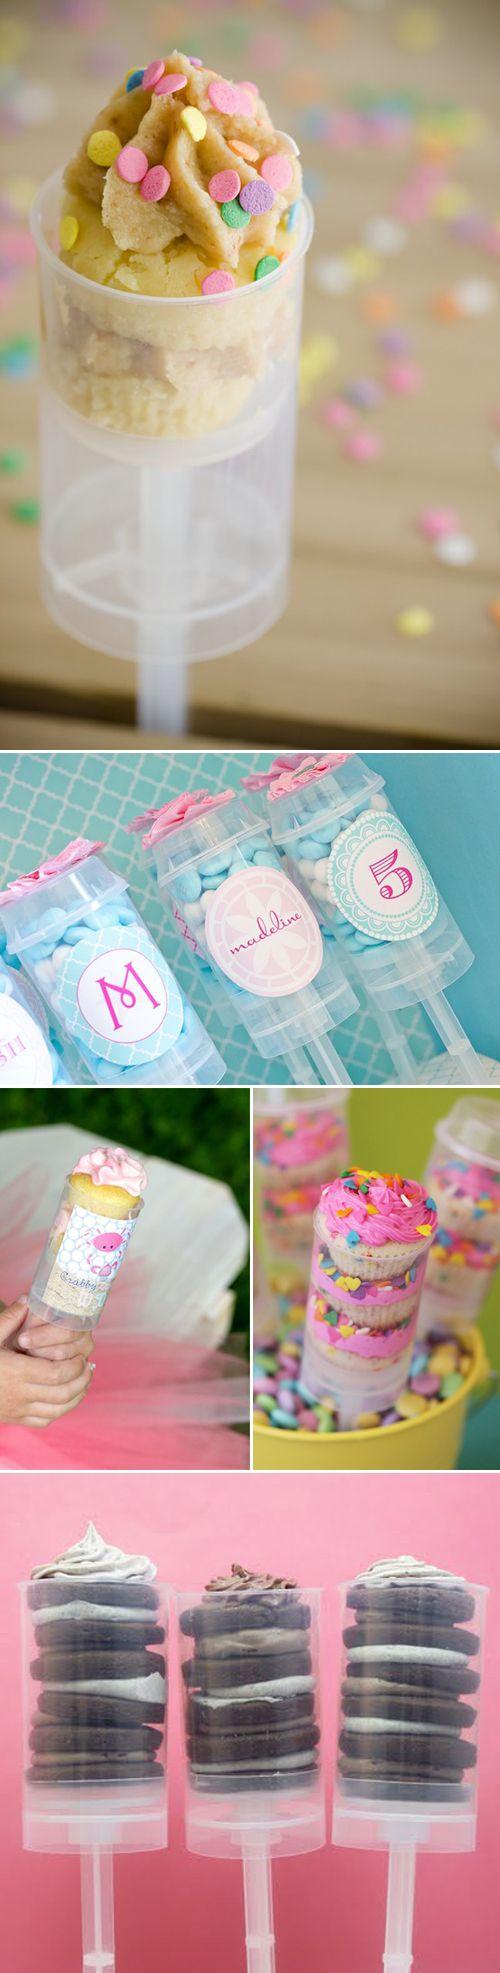 push-up cakes: Party Favors, Push Pop, Cakes Pop, Party Treats, Pushup Cakes, Cute Idea, Birthday Idea, Party Idea, Party Cakes